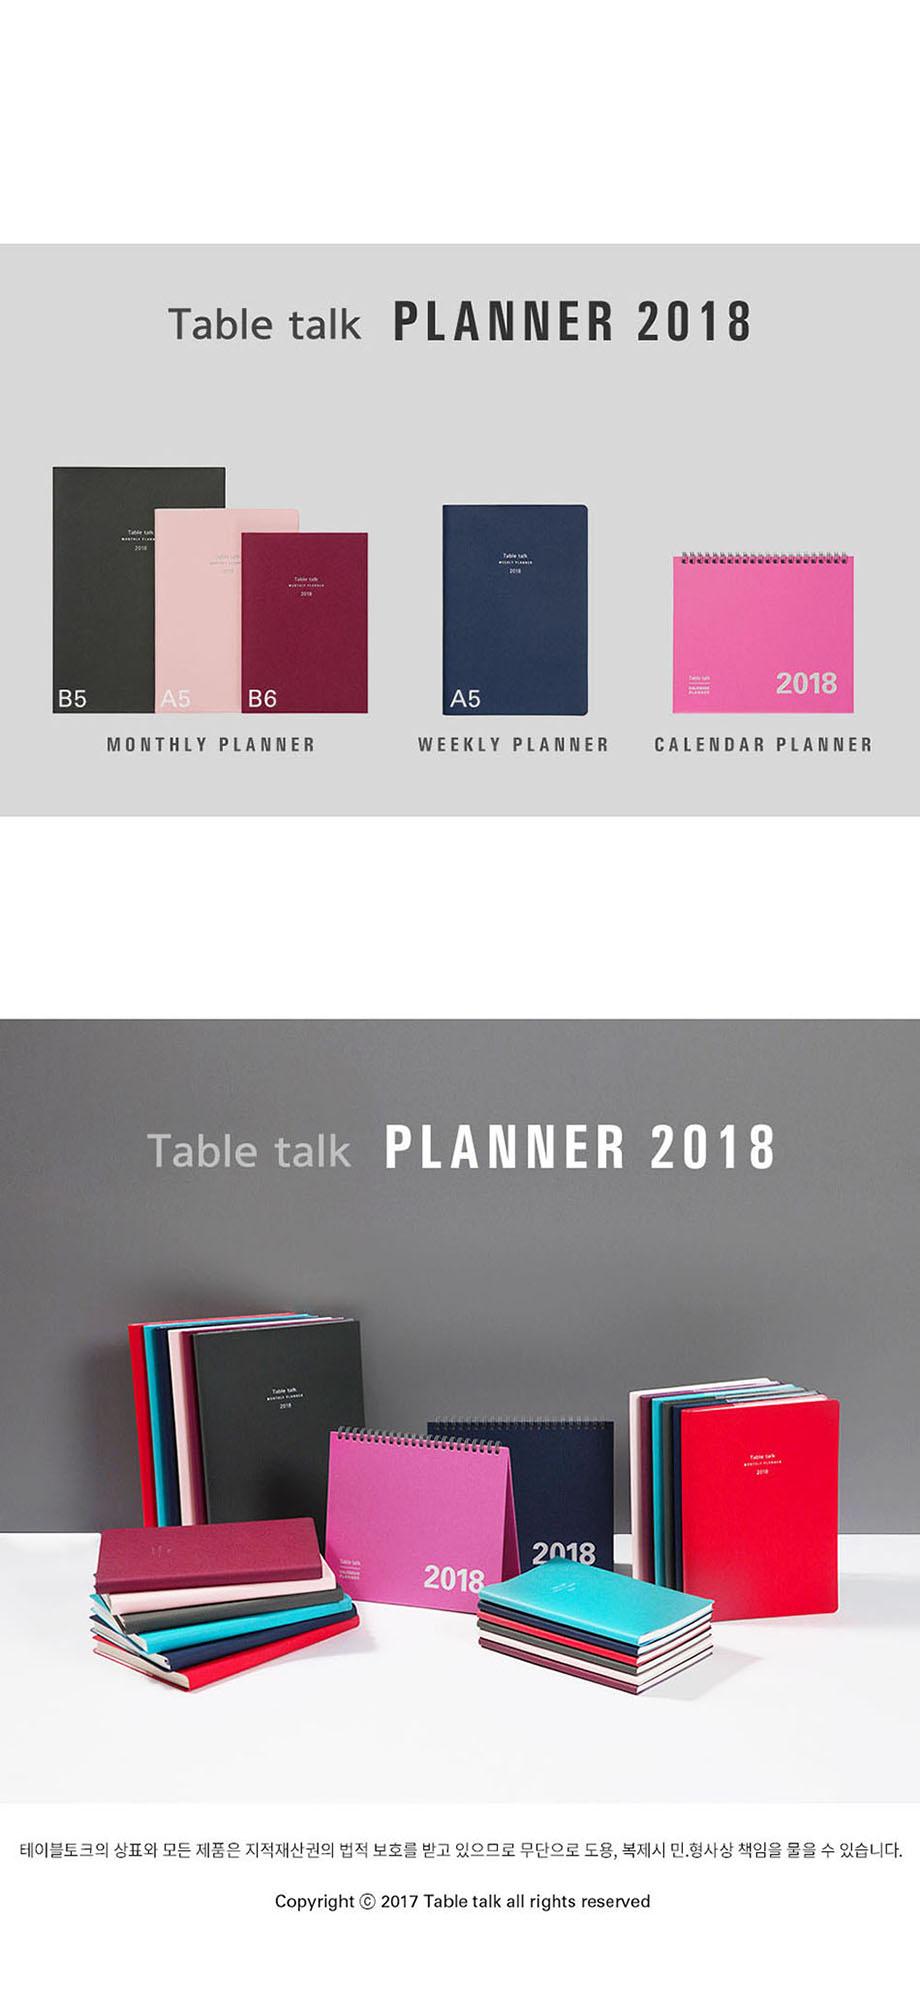 Monthly Planner 2018 B514,000원-안테나샵디자인문구, 플래너/스케줄러, 플래너, 먼슬리플래너바보사랑Monthly Planner 2018 B514,000원-안테나샵디자인문구, 플래너/스케줄러, 플래너, 먼슬리플래너바보사랑